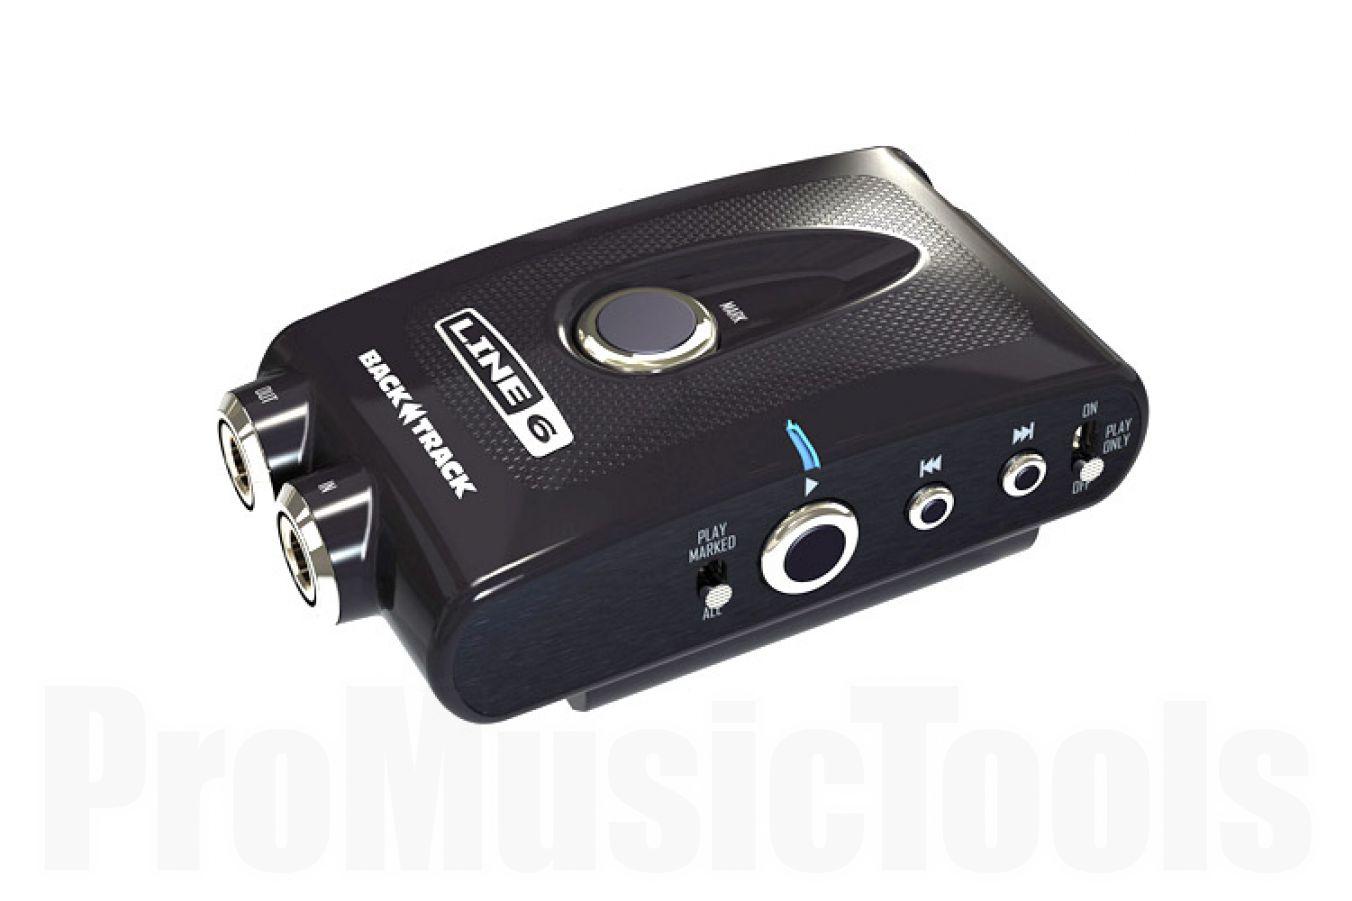 Line6 BackTrack Portable Digital Recorder